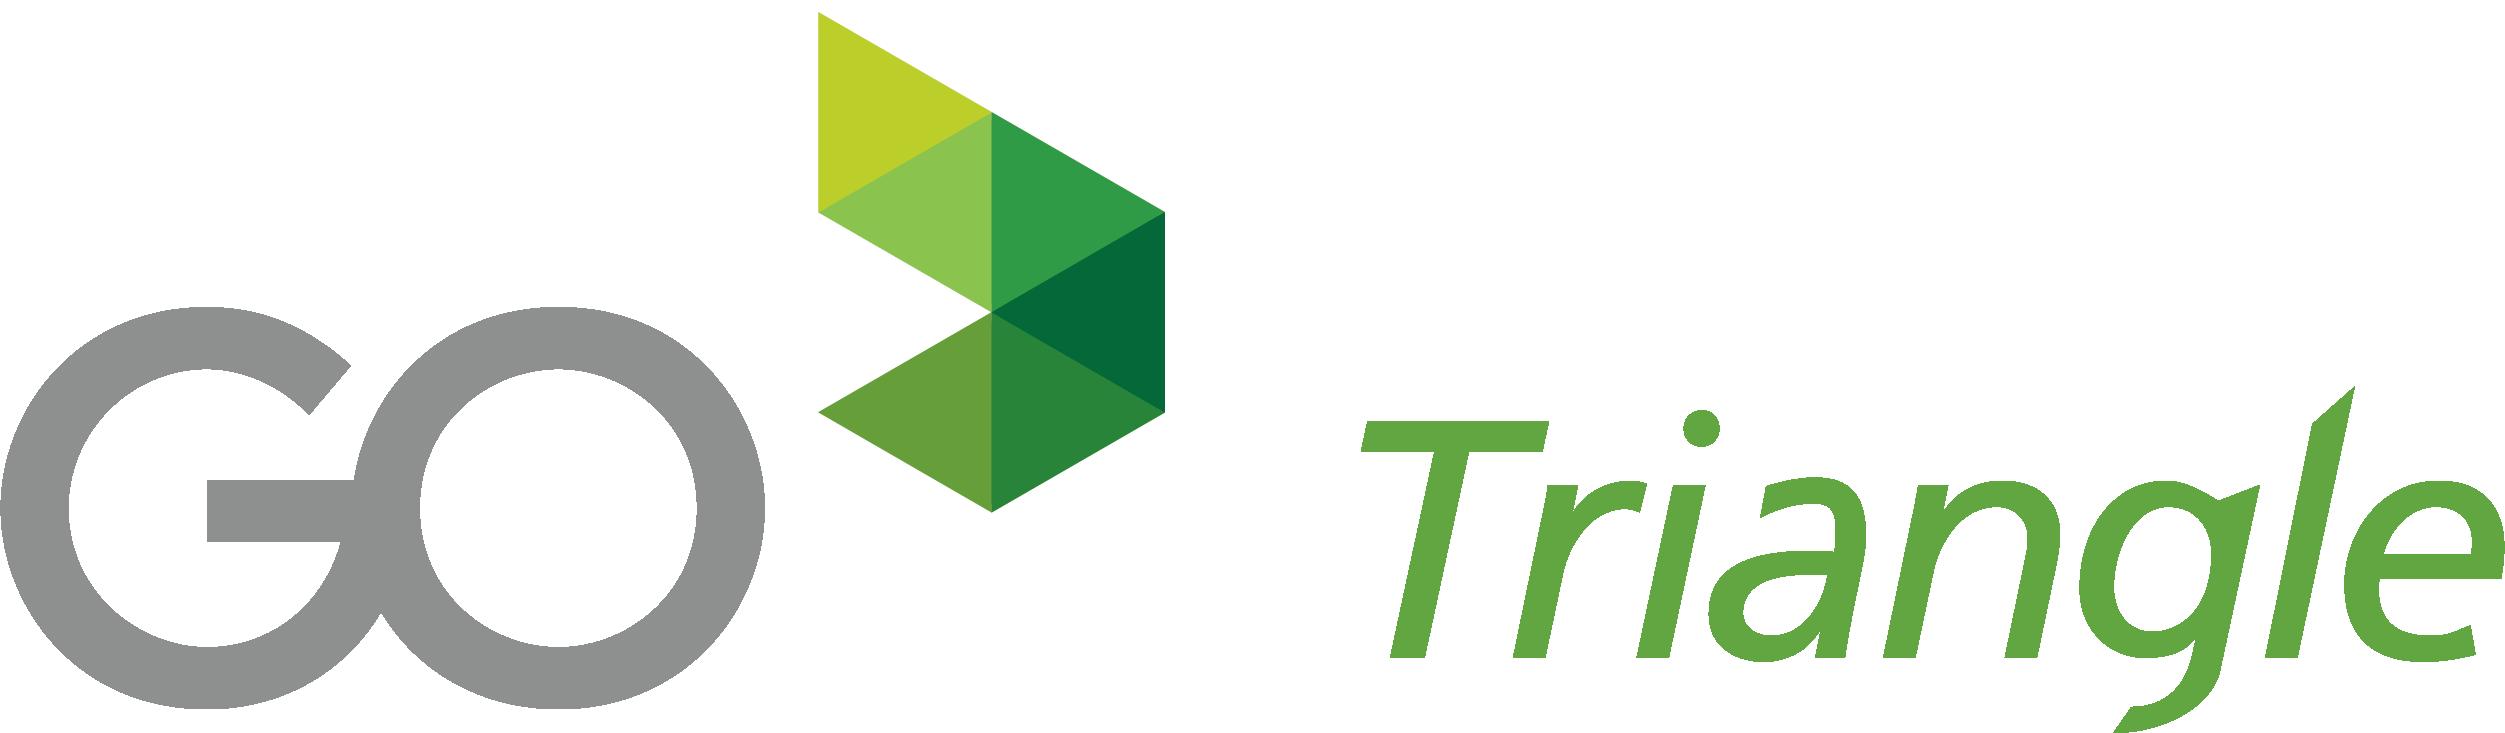 how to make logo triangle